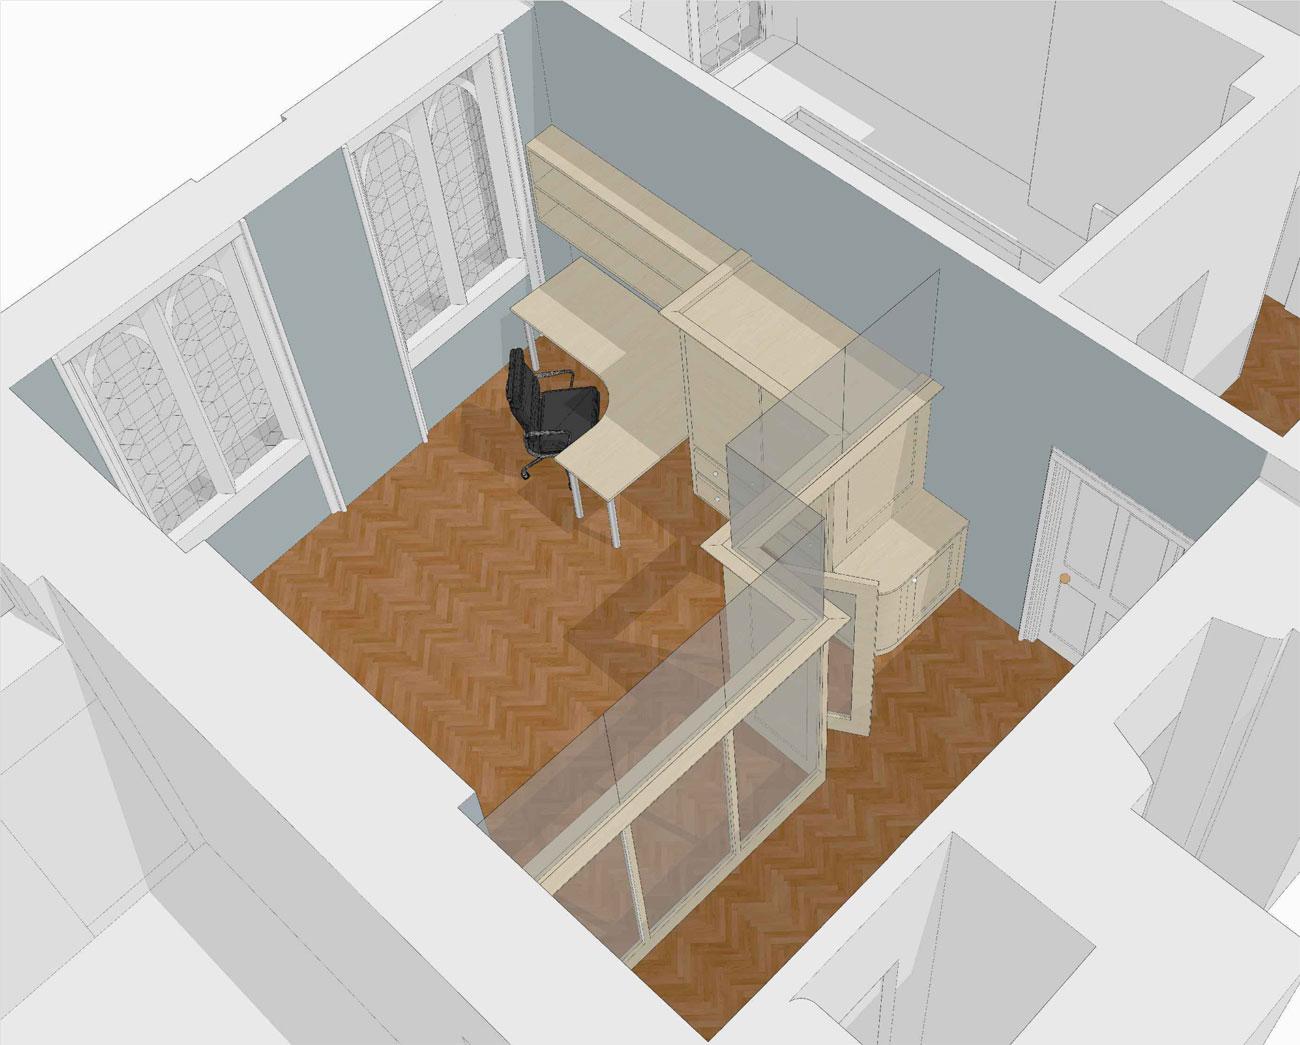 St-Dunstans-church-room-3dplan1